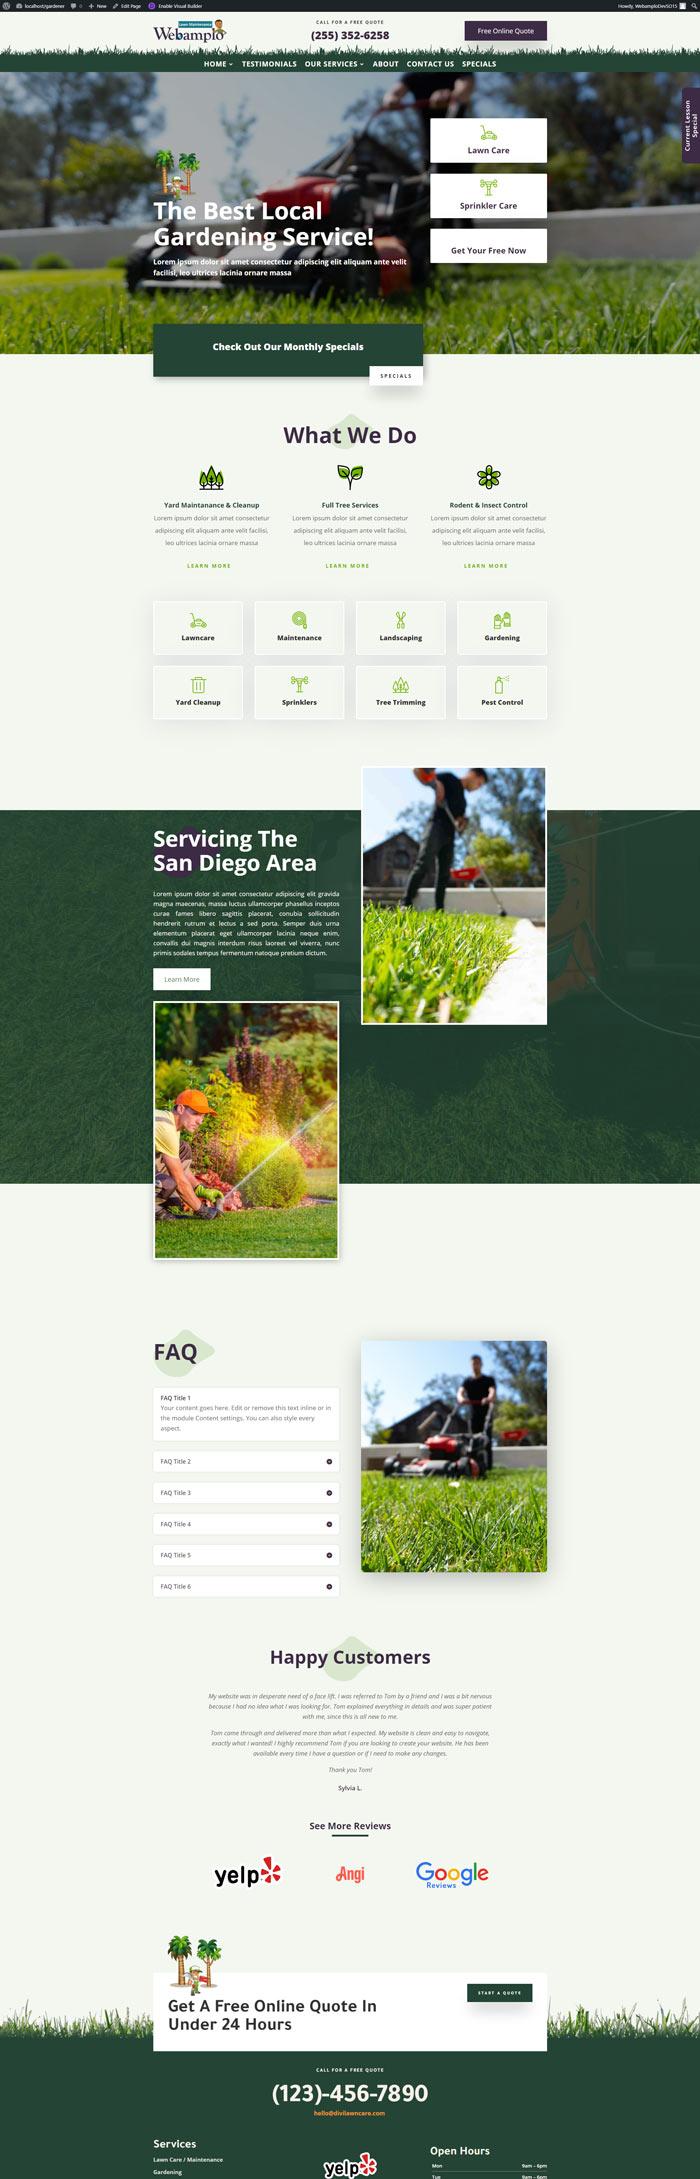 Webamplo Landscape Gardner Website Package